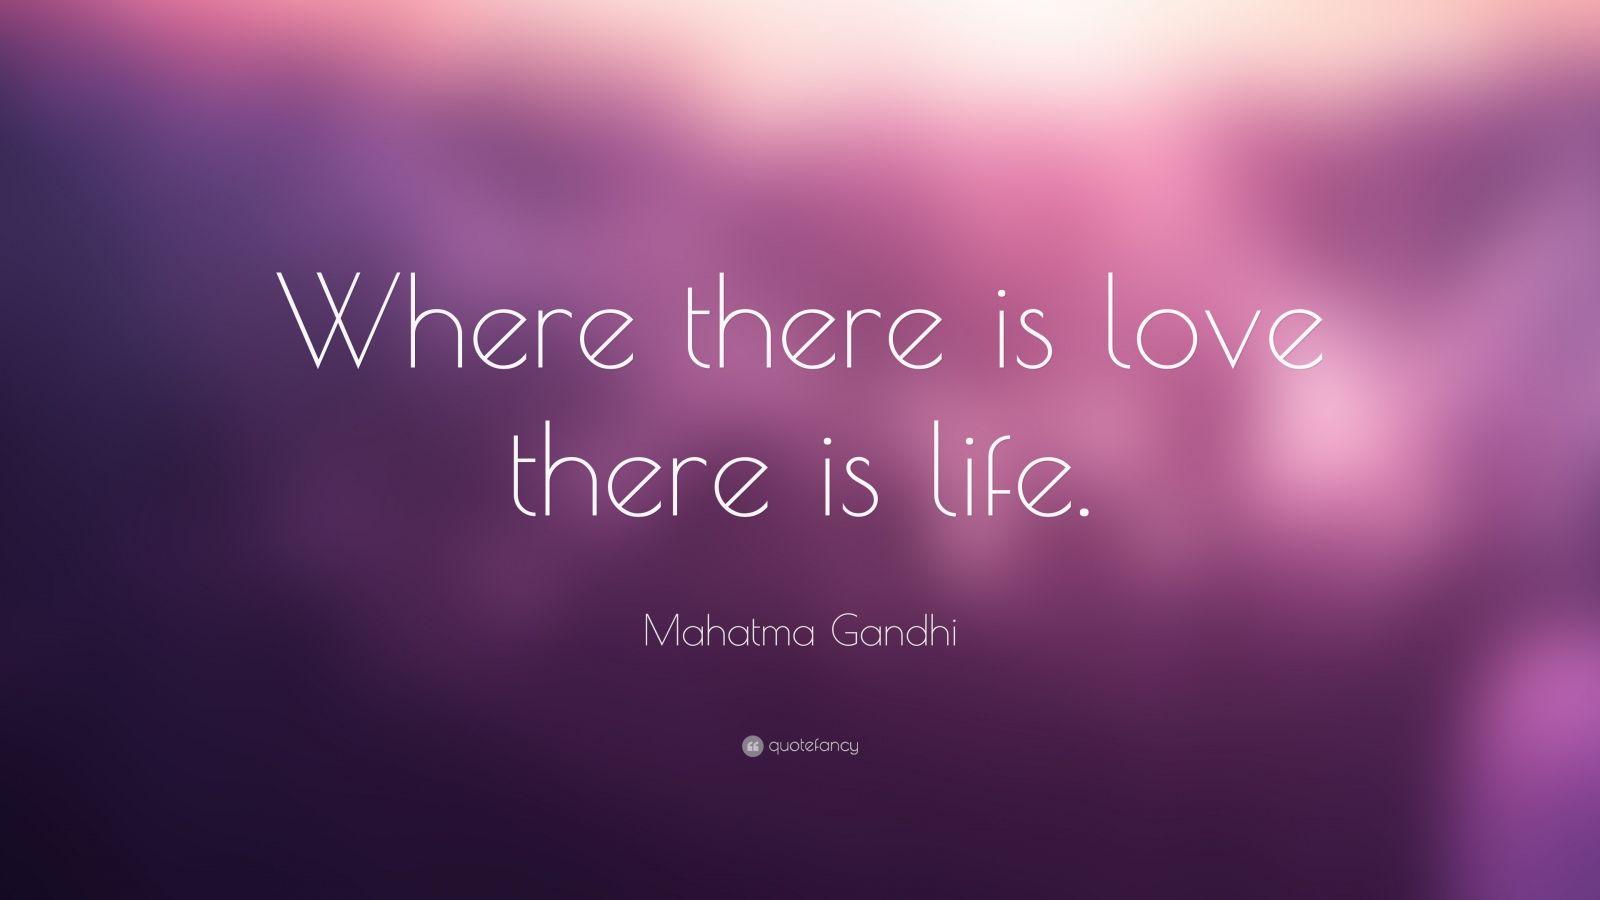 Napoleon Hill Quotes Wallpaper Mahatma Gandhi Quotes 29 Wallpapers Quotefancy